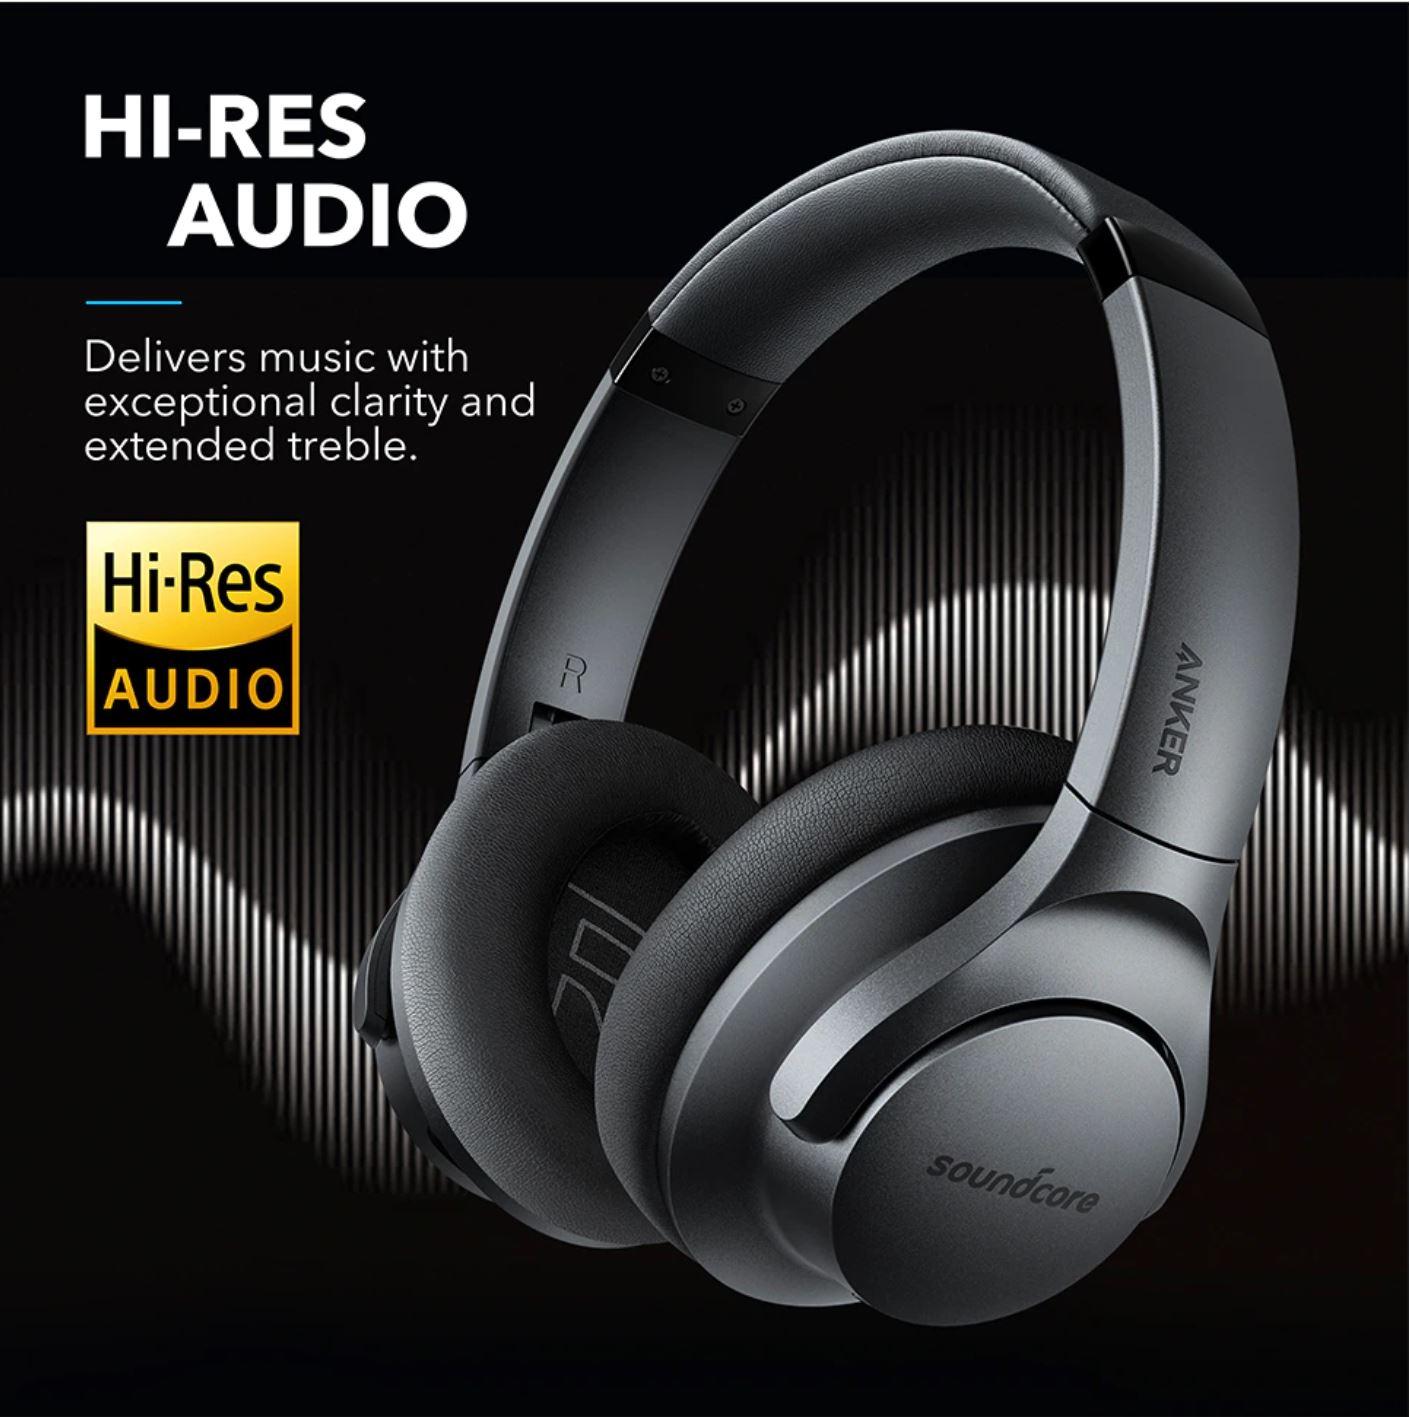 Święto marki Anker na Aliexpress - Anker Soundcore Life Q20 Hybrid Active Noise Cancelling Headphones